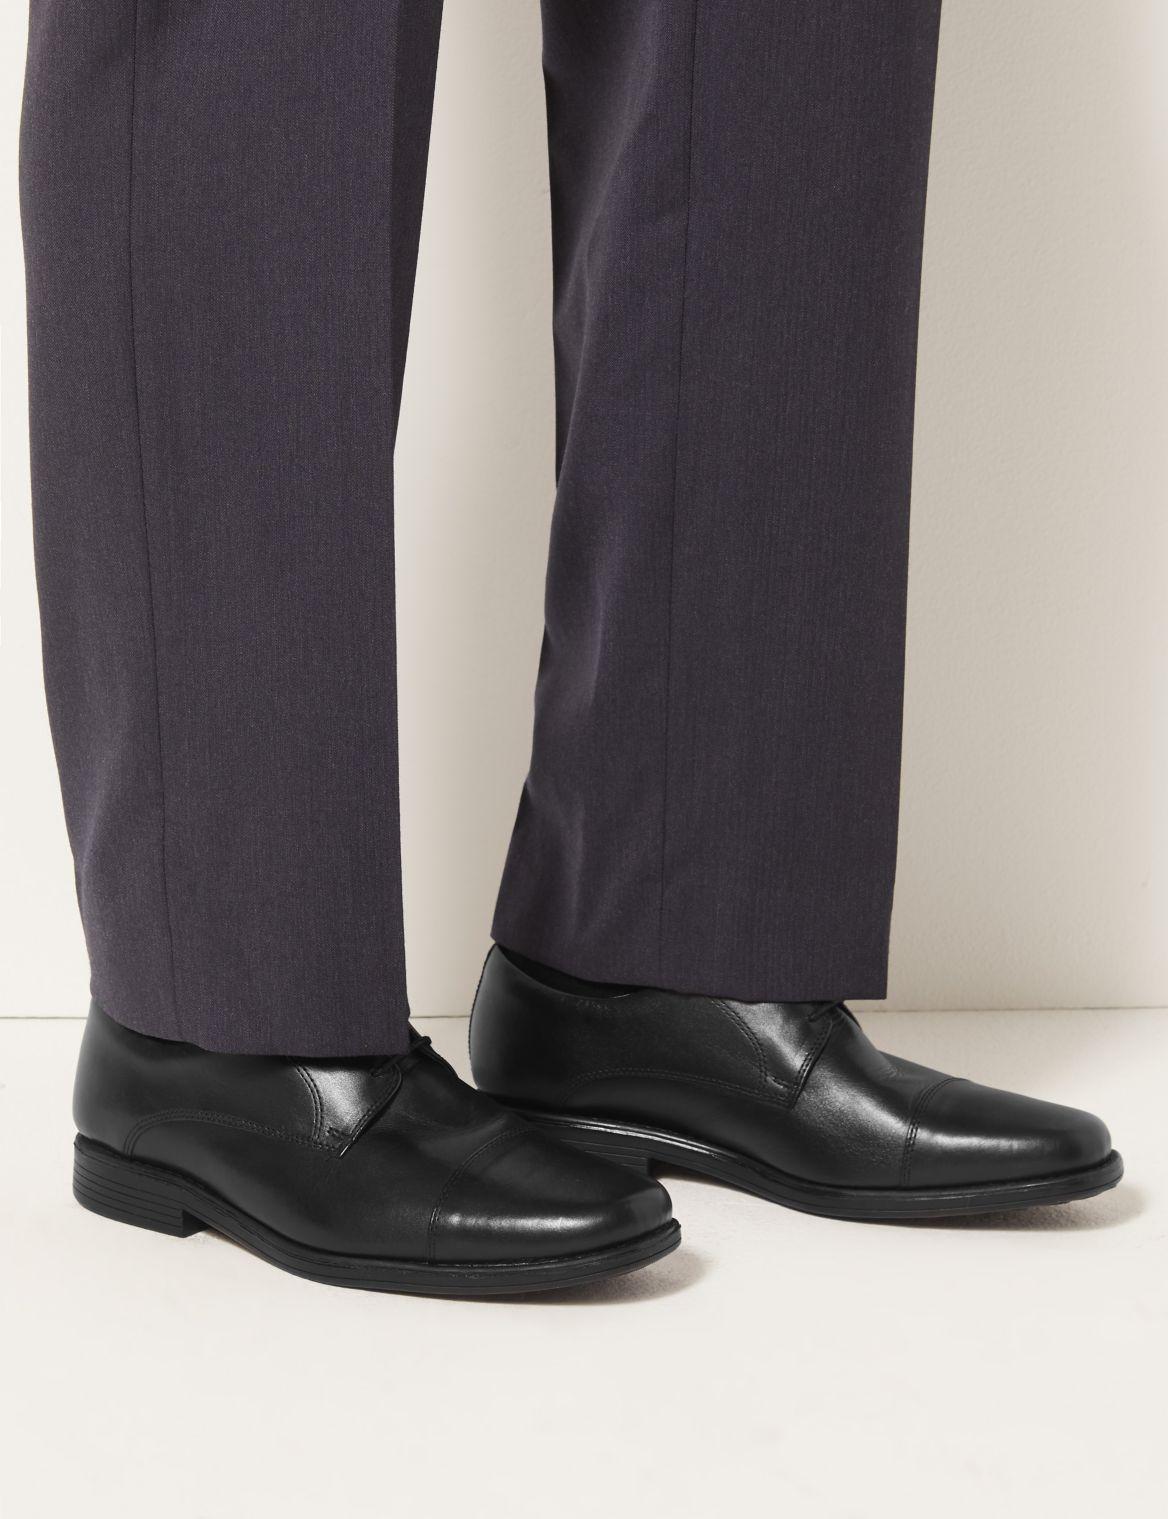 Leather Toe Cap Derby Lace-up Shoes black